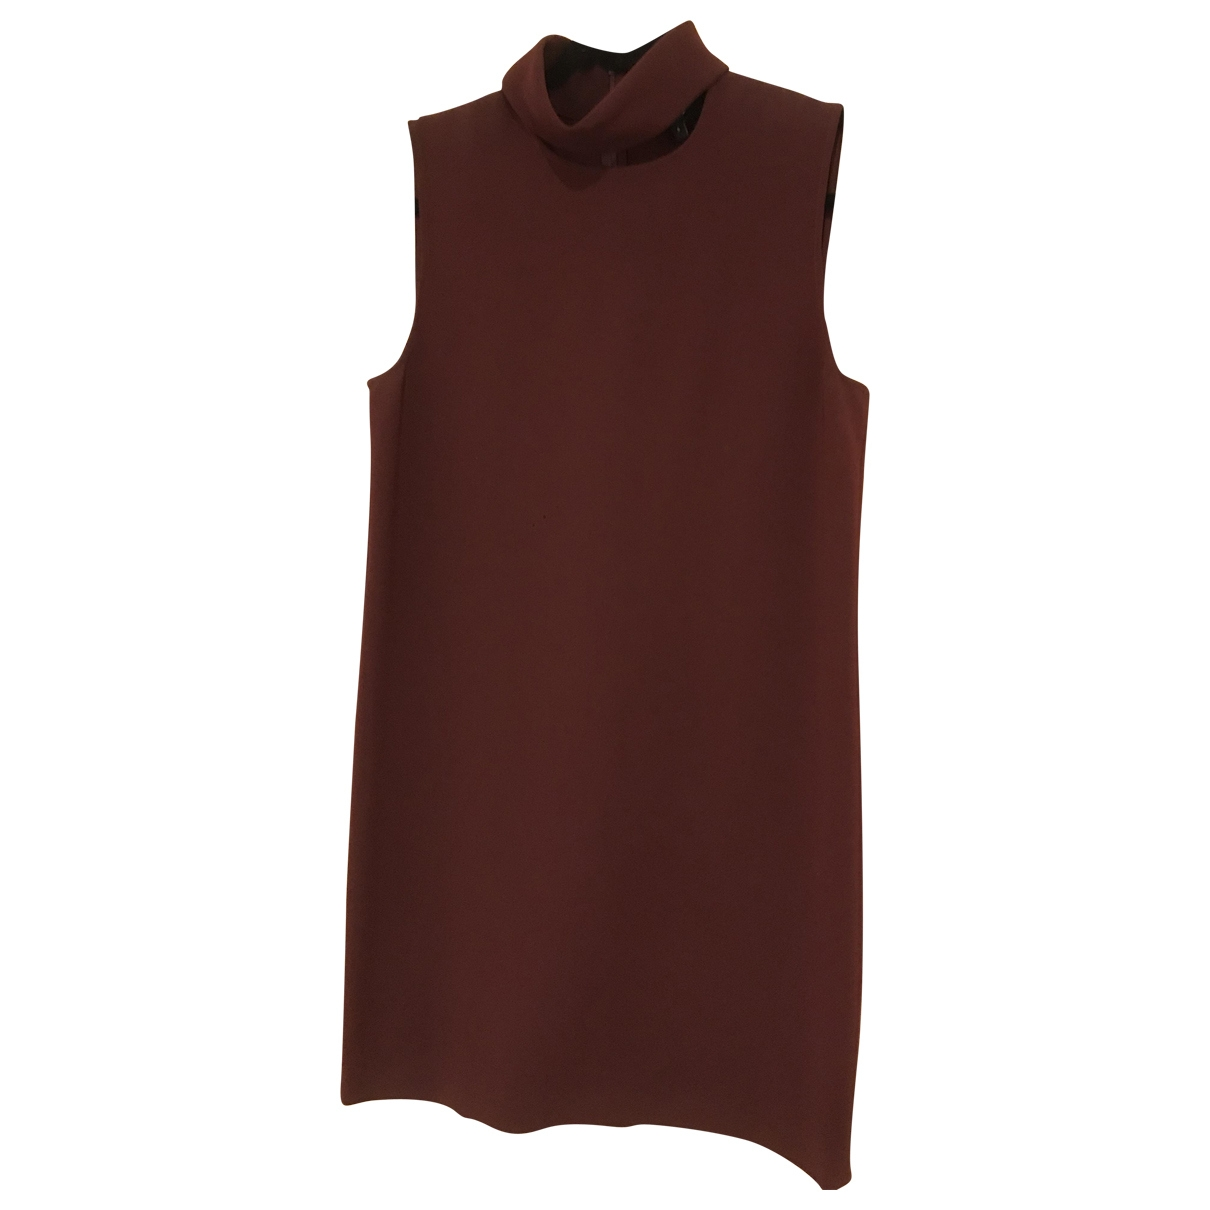 Theory \N Burgundy Linen dress for Women 6 US